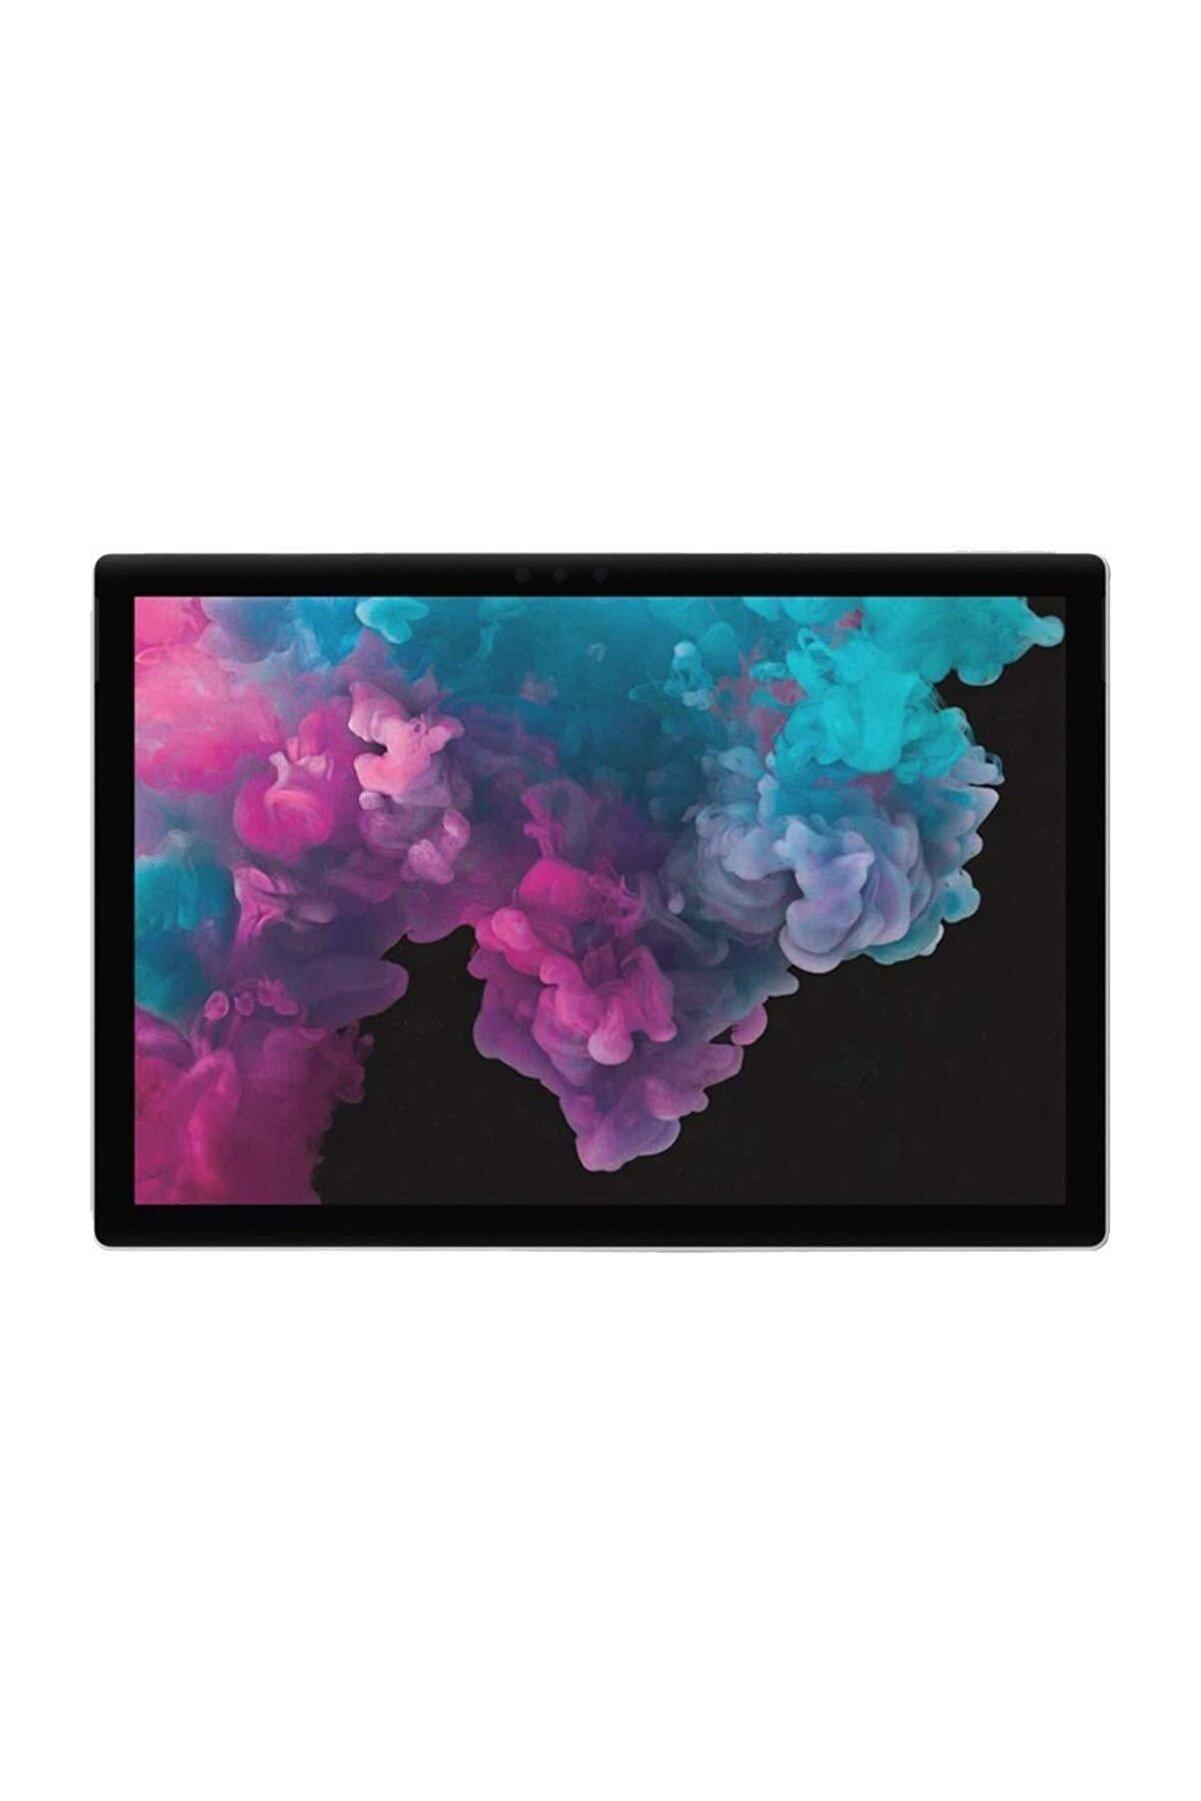 "Microsoft Surface Pro 6 Intel Core i5 8250U 8GB 128GB SSD Windows 10 Home 12.3"" FHD İkisi Bir Arada LGP-00006"